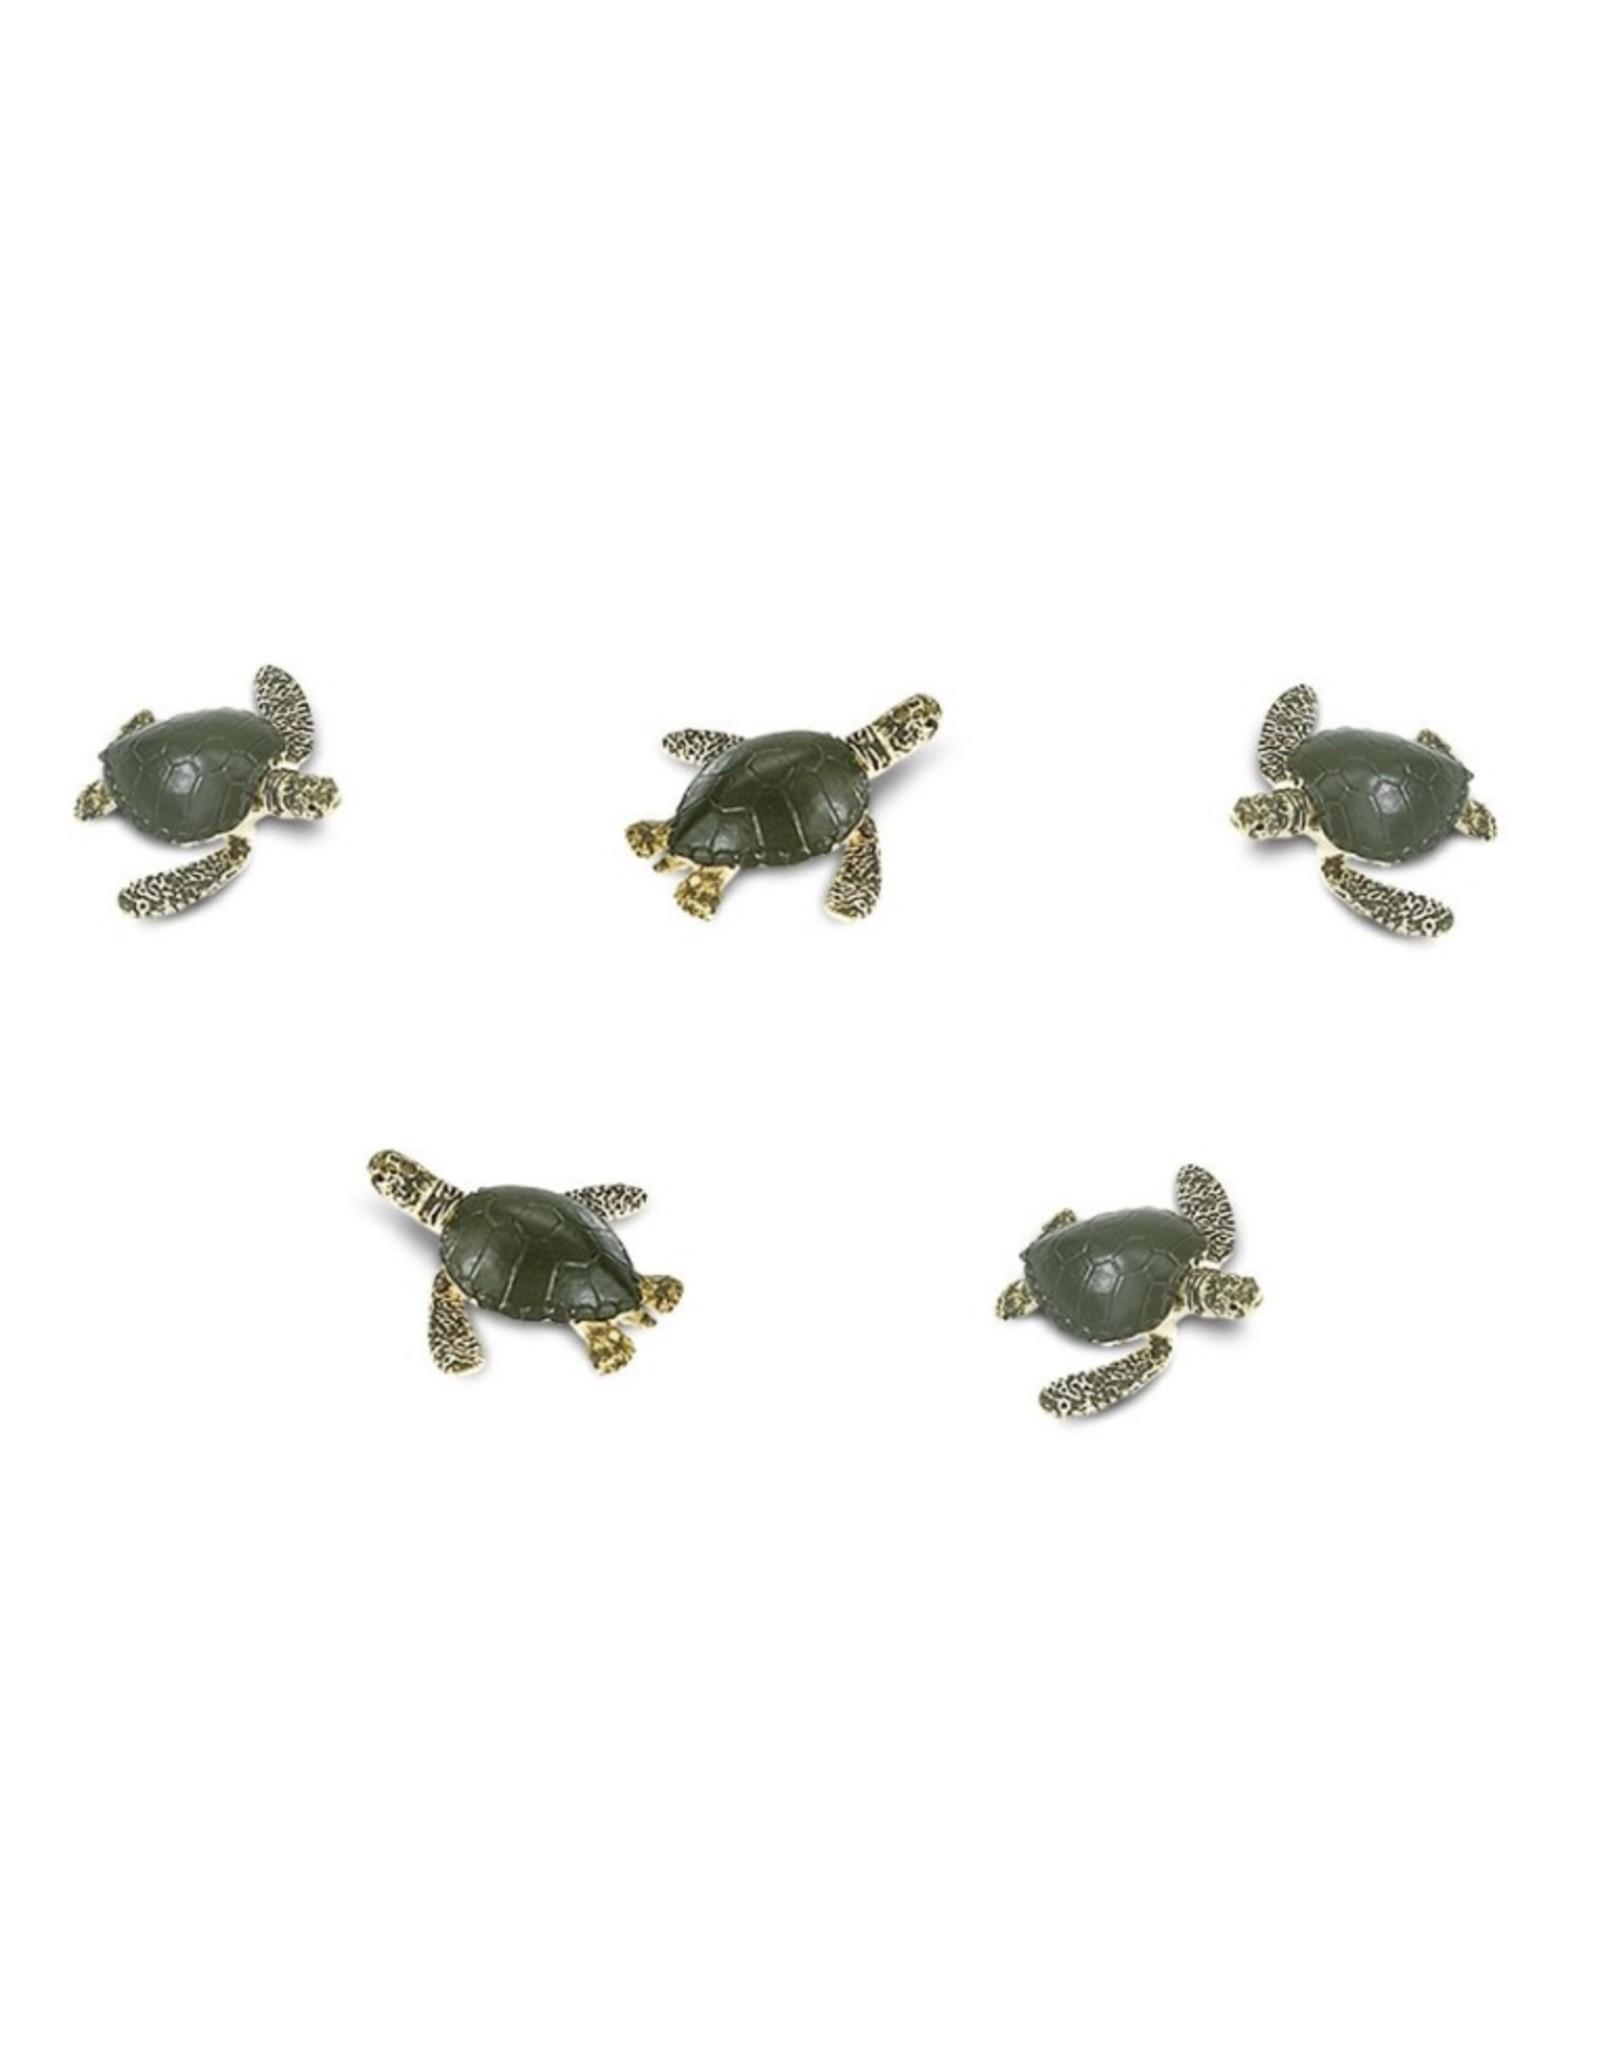 Goodluck mini - sea turtle